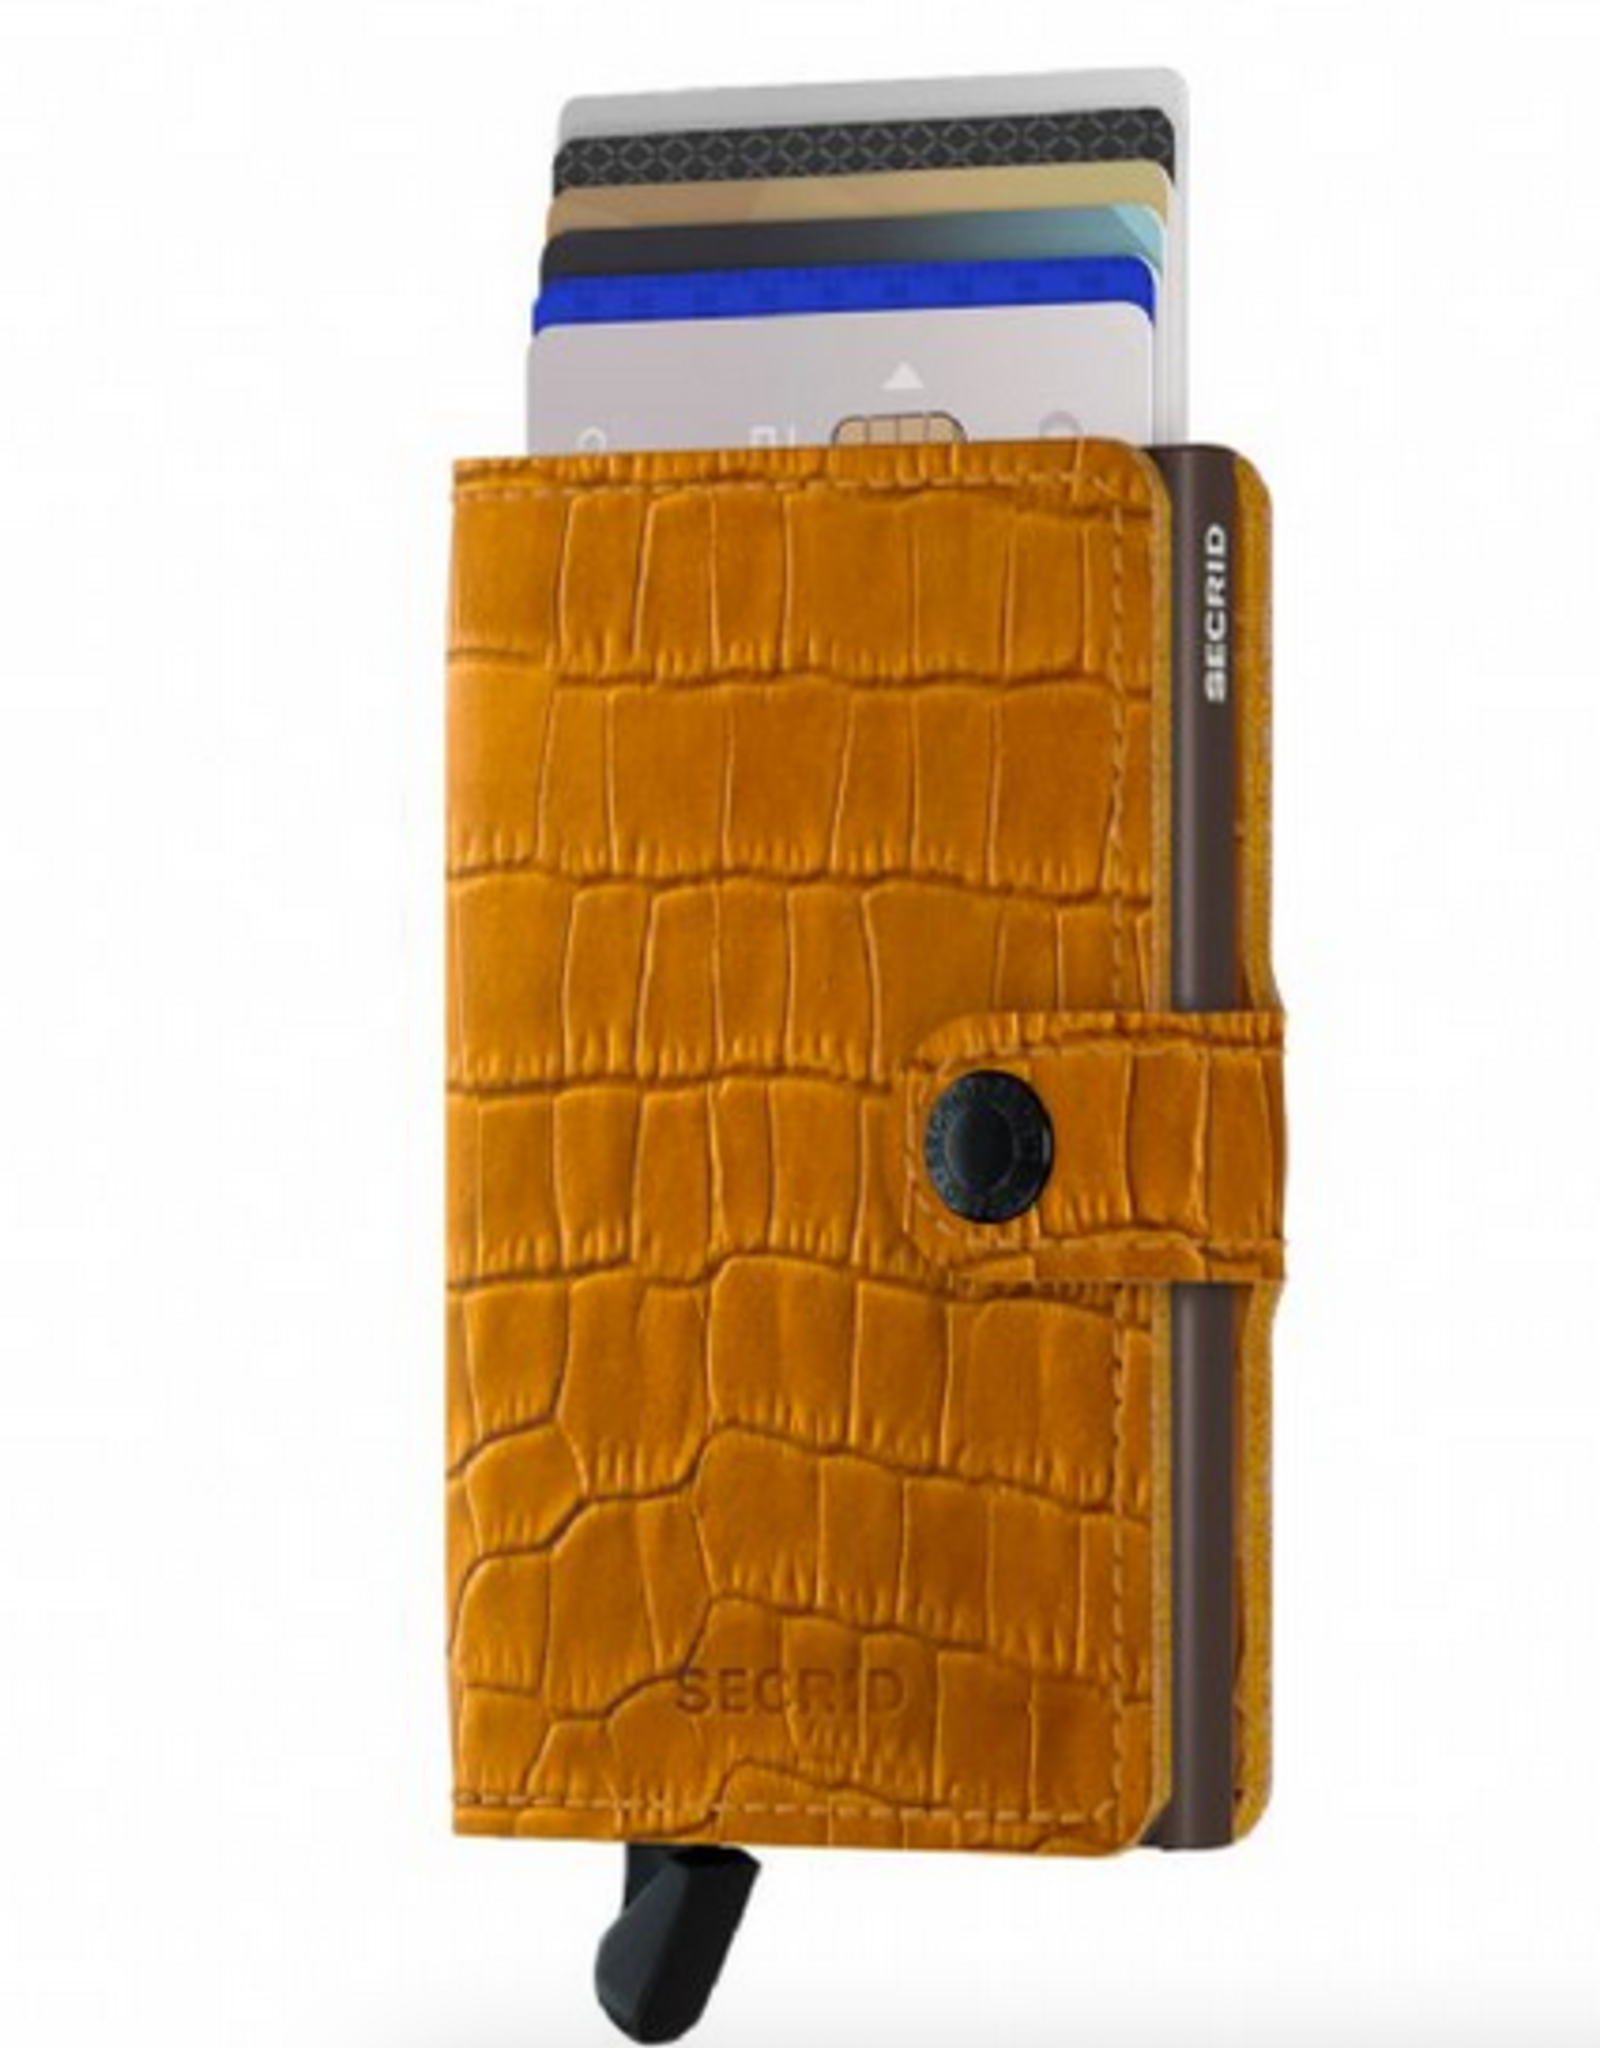 Secrid Secrid - Miniwallet - Vintage Ochre - Brown